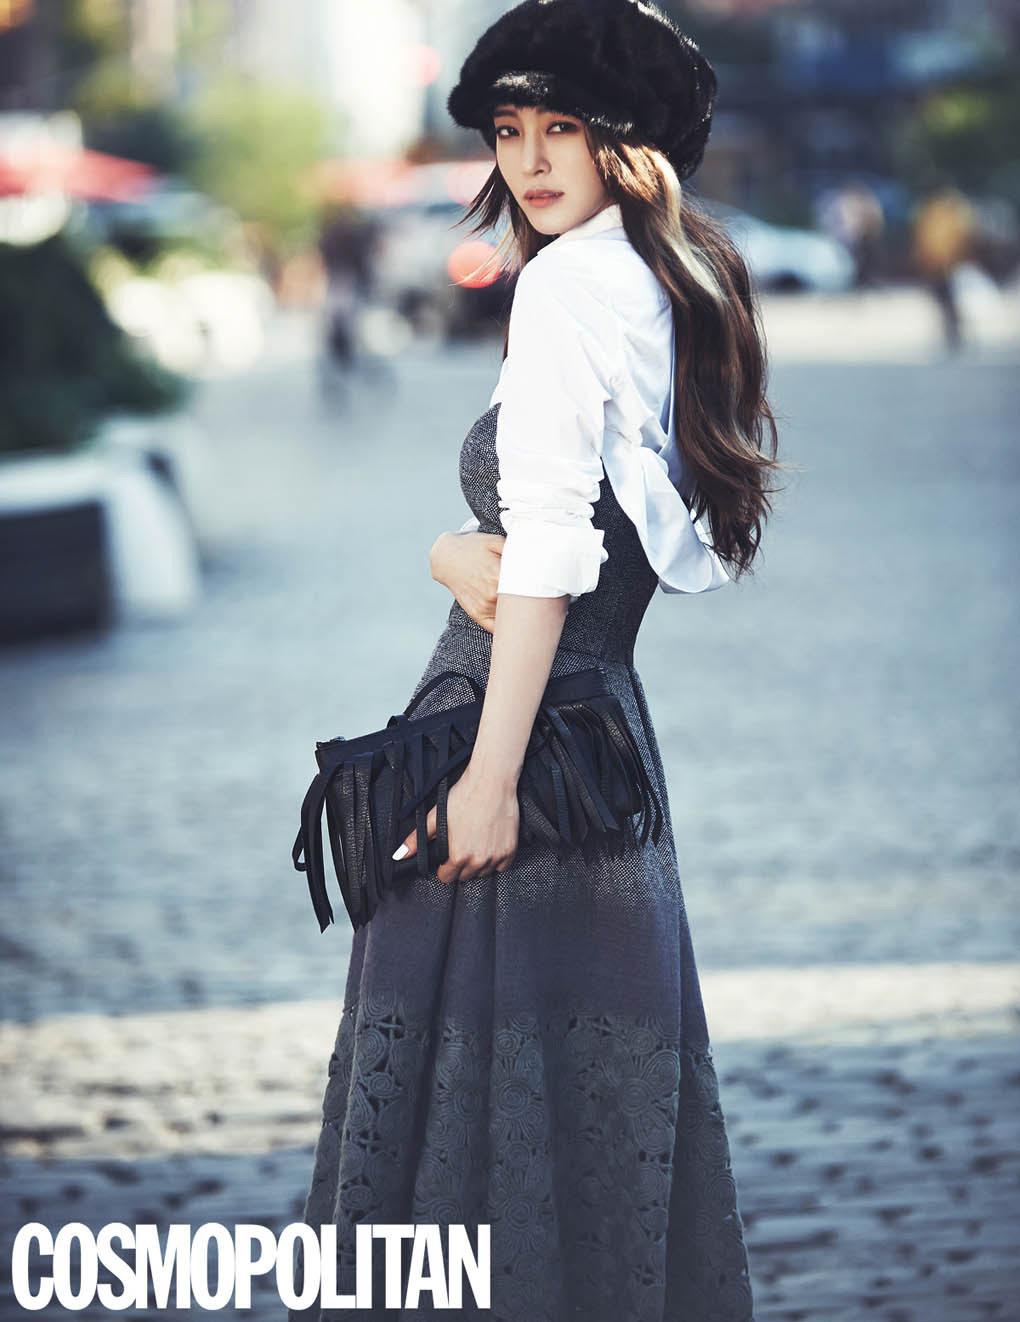 Han Ye Seul - Cosmopolitan Magazine November Issue '14